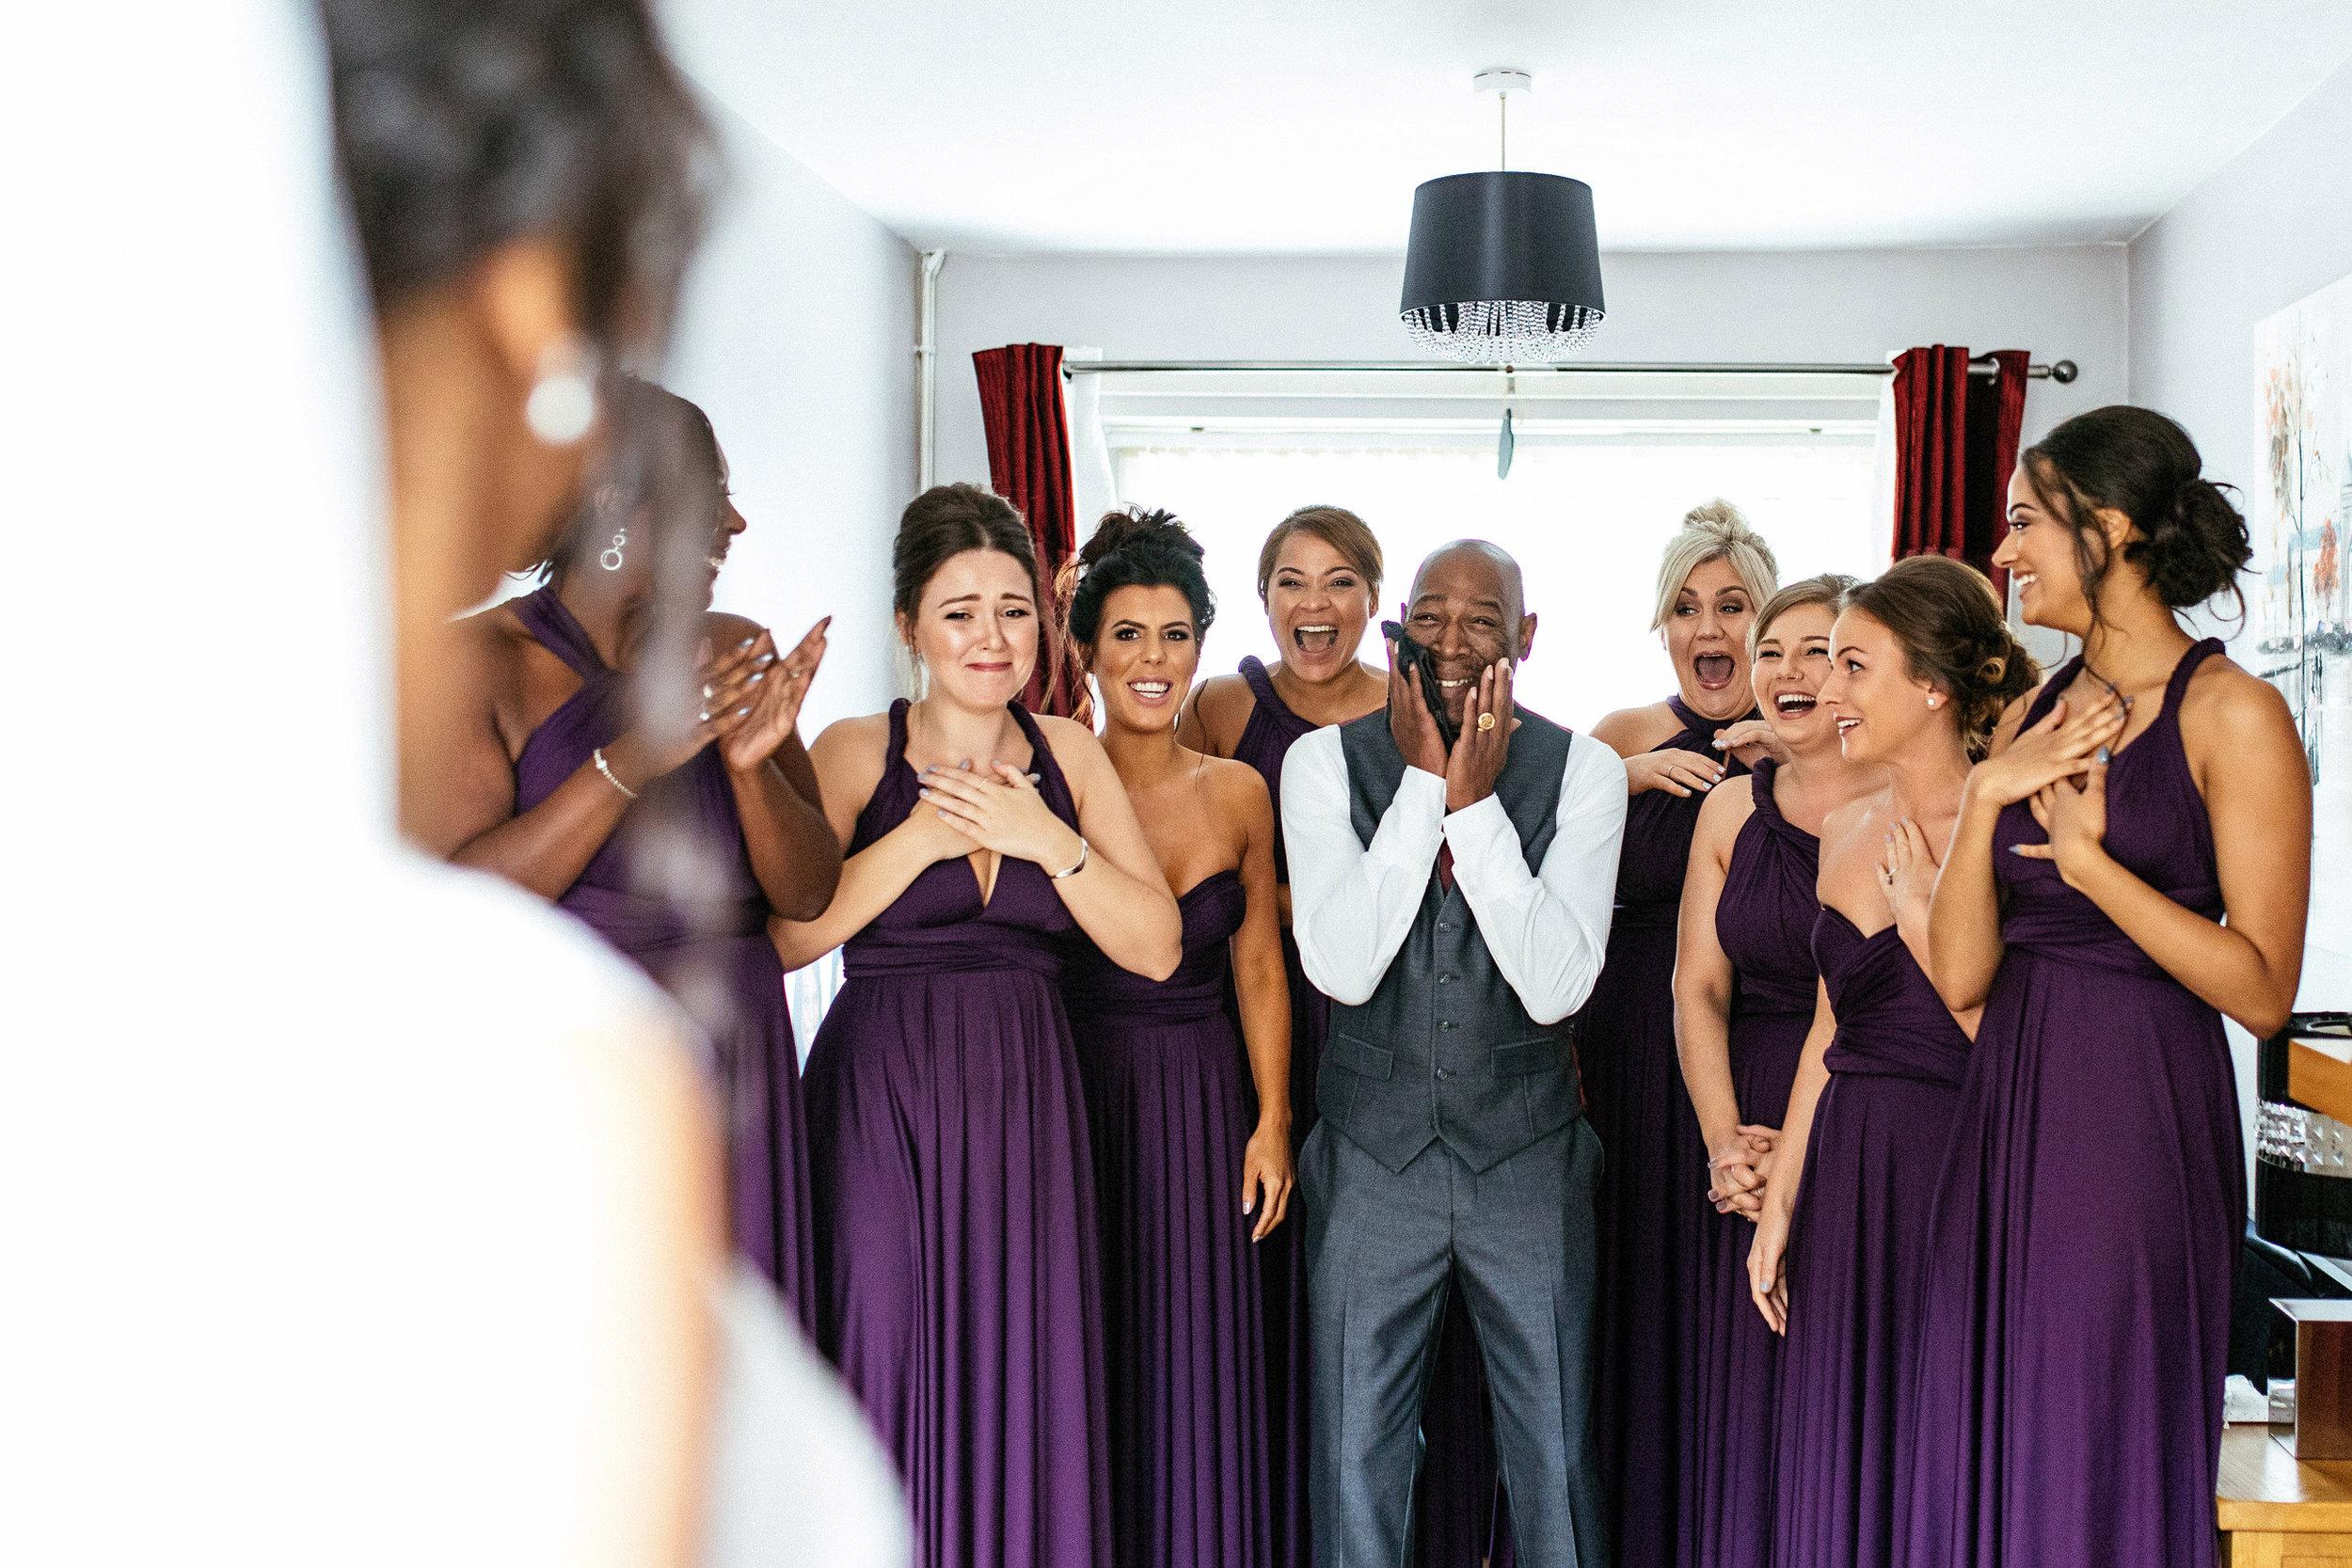 The-Bond-Company-Wedding-Photography-15-1.jpg